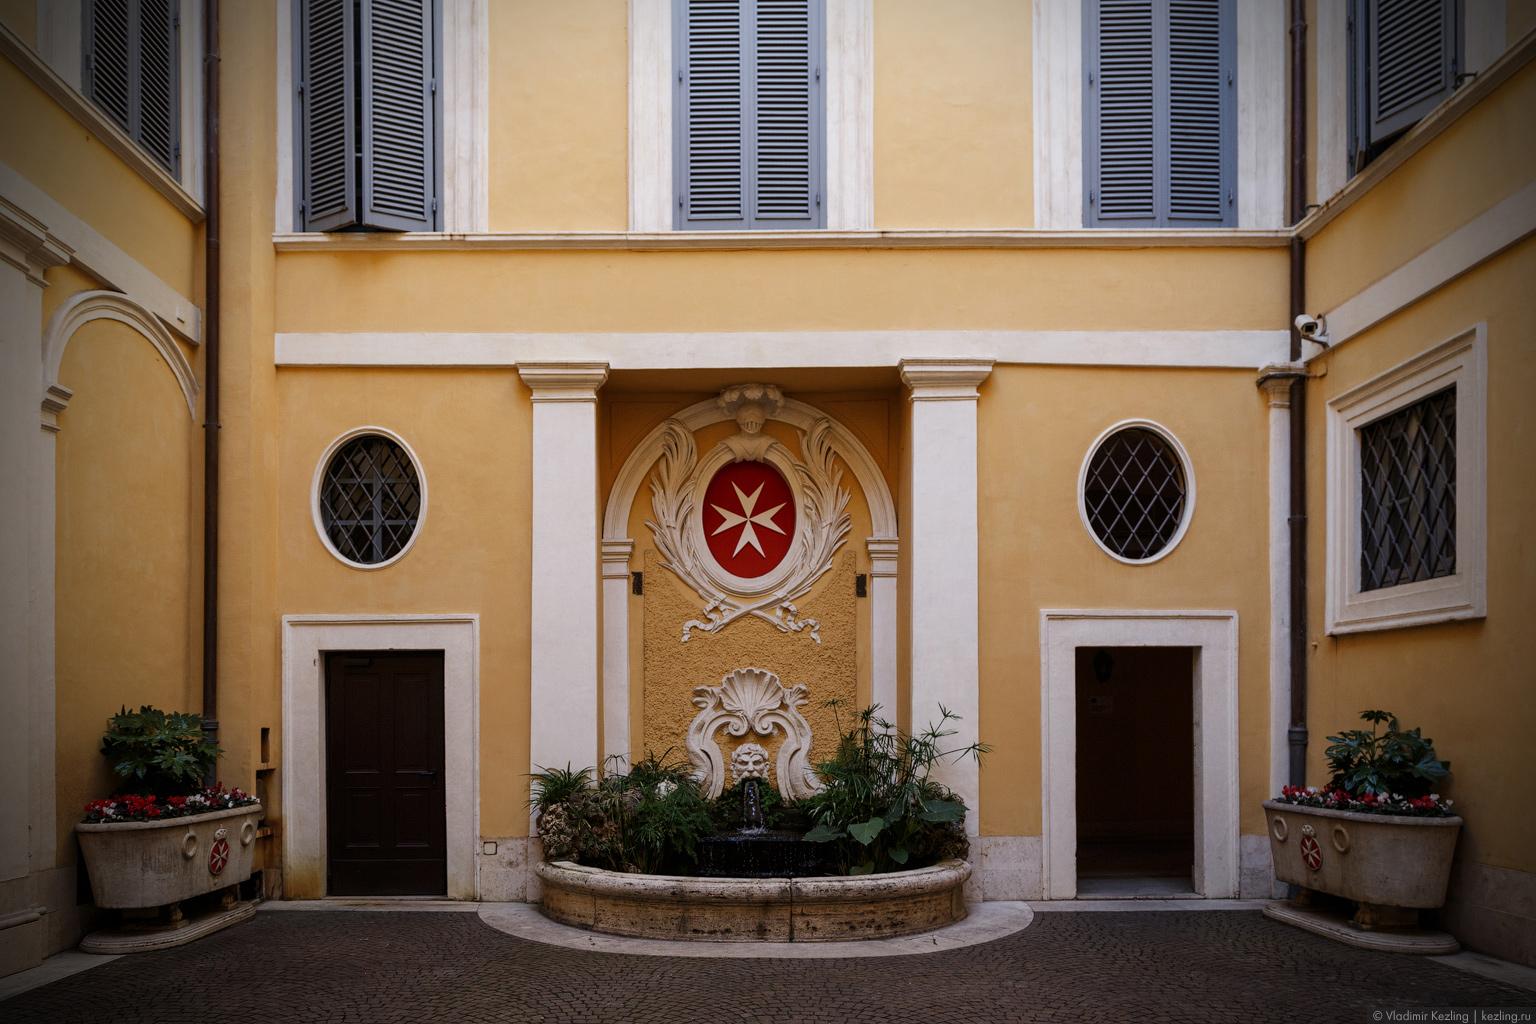 Мальтийский Орден: Магистральная вилла и Магистральный дворец